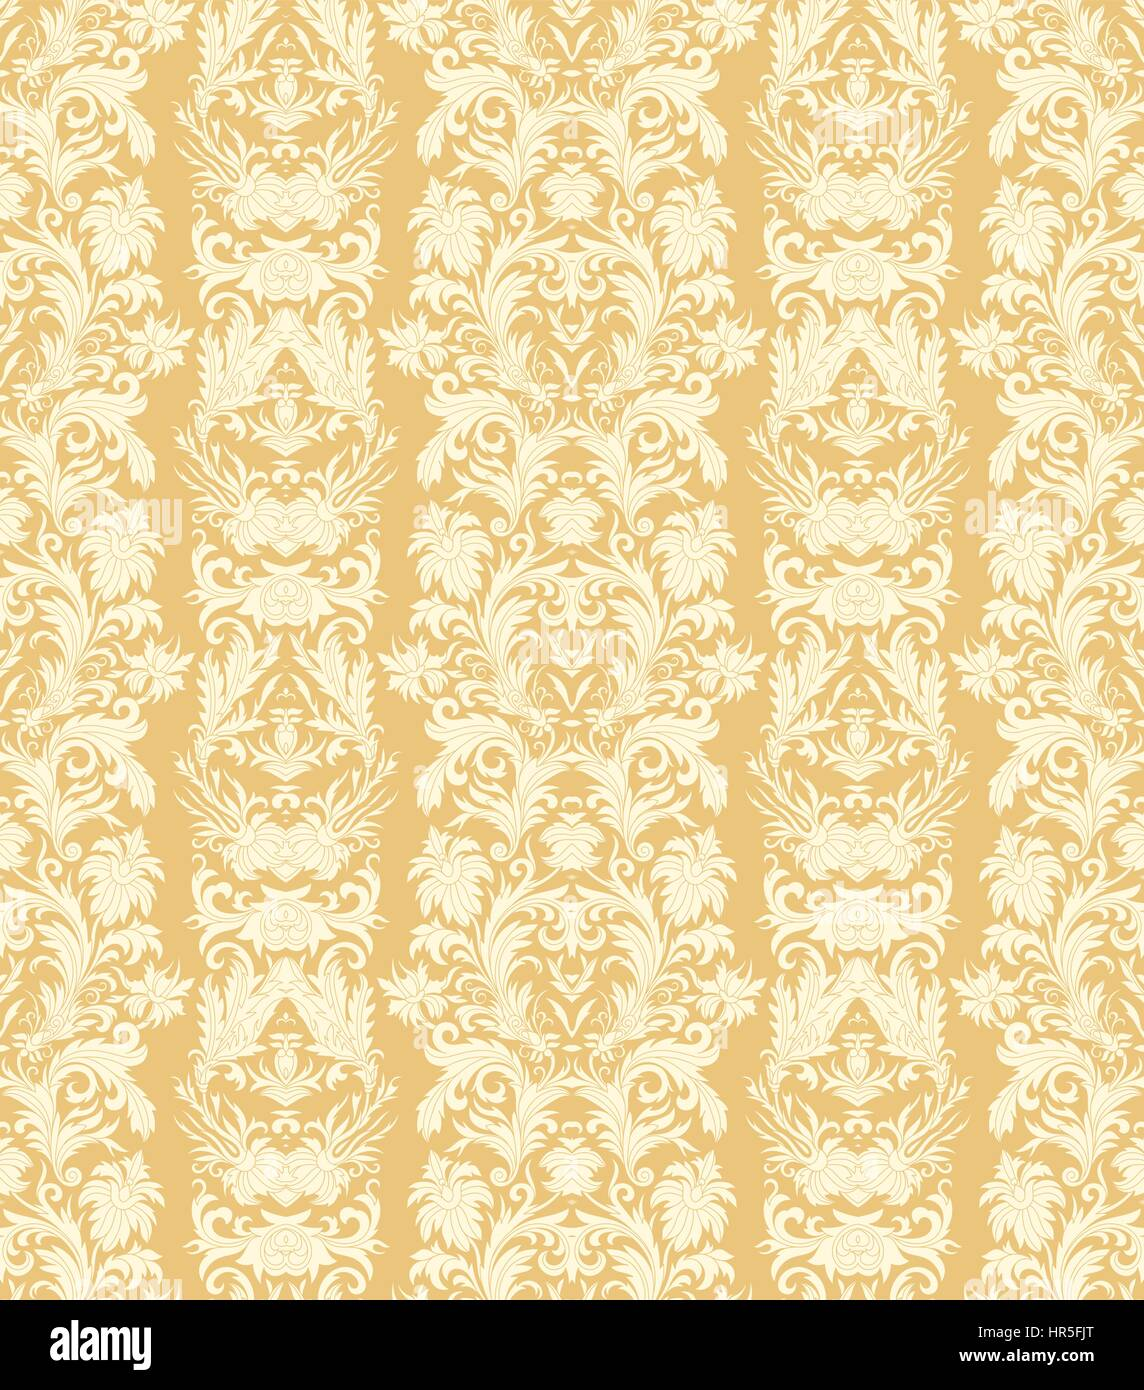 Royal Striped Seamless Pattern Rococo Floral Wallpaper Damask